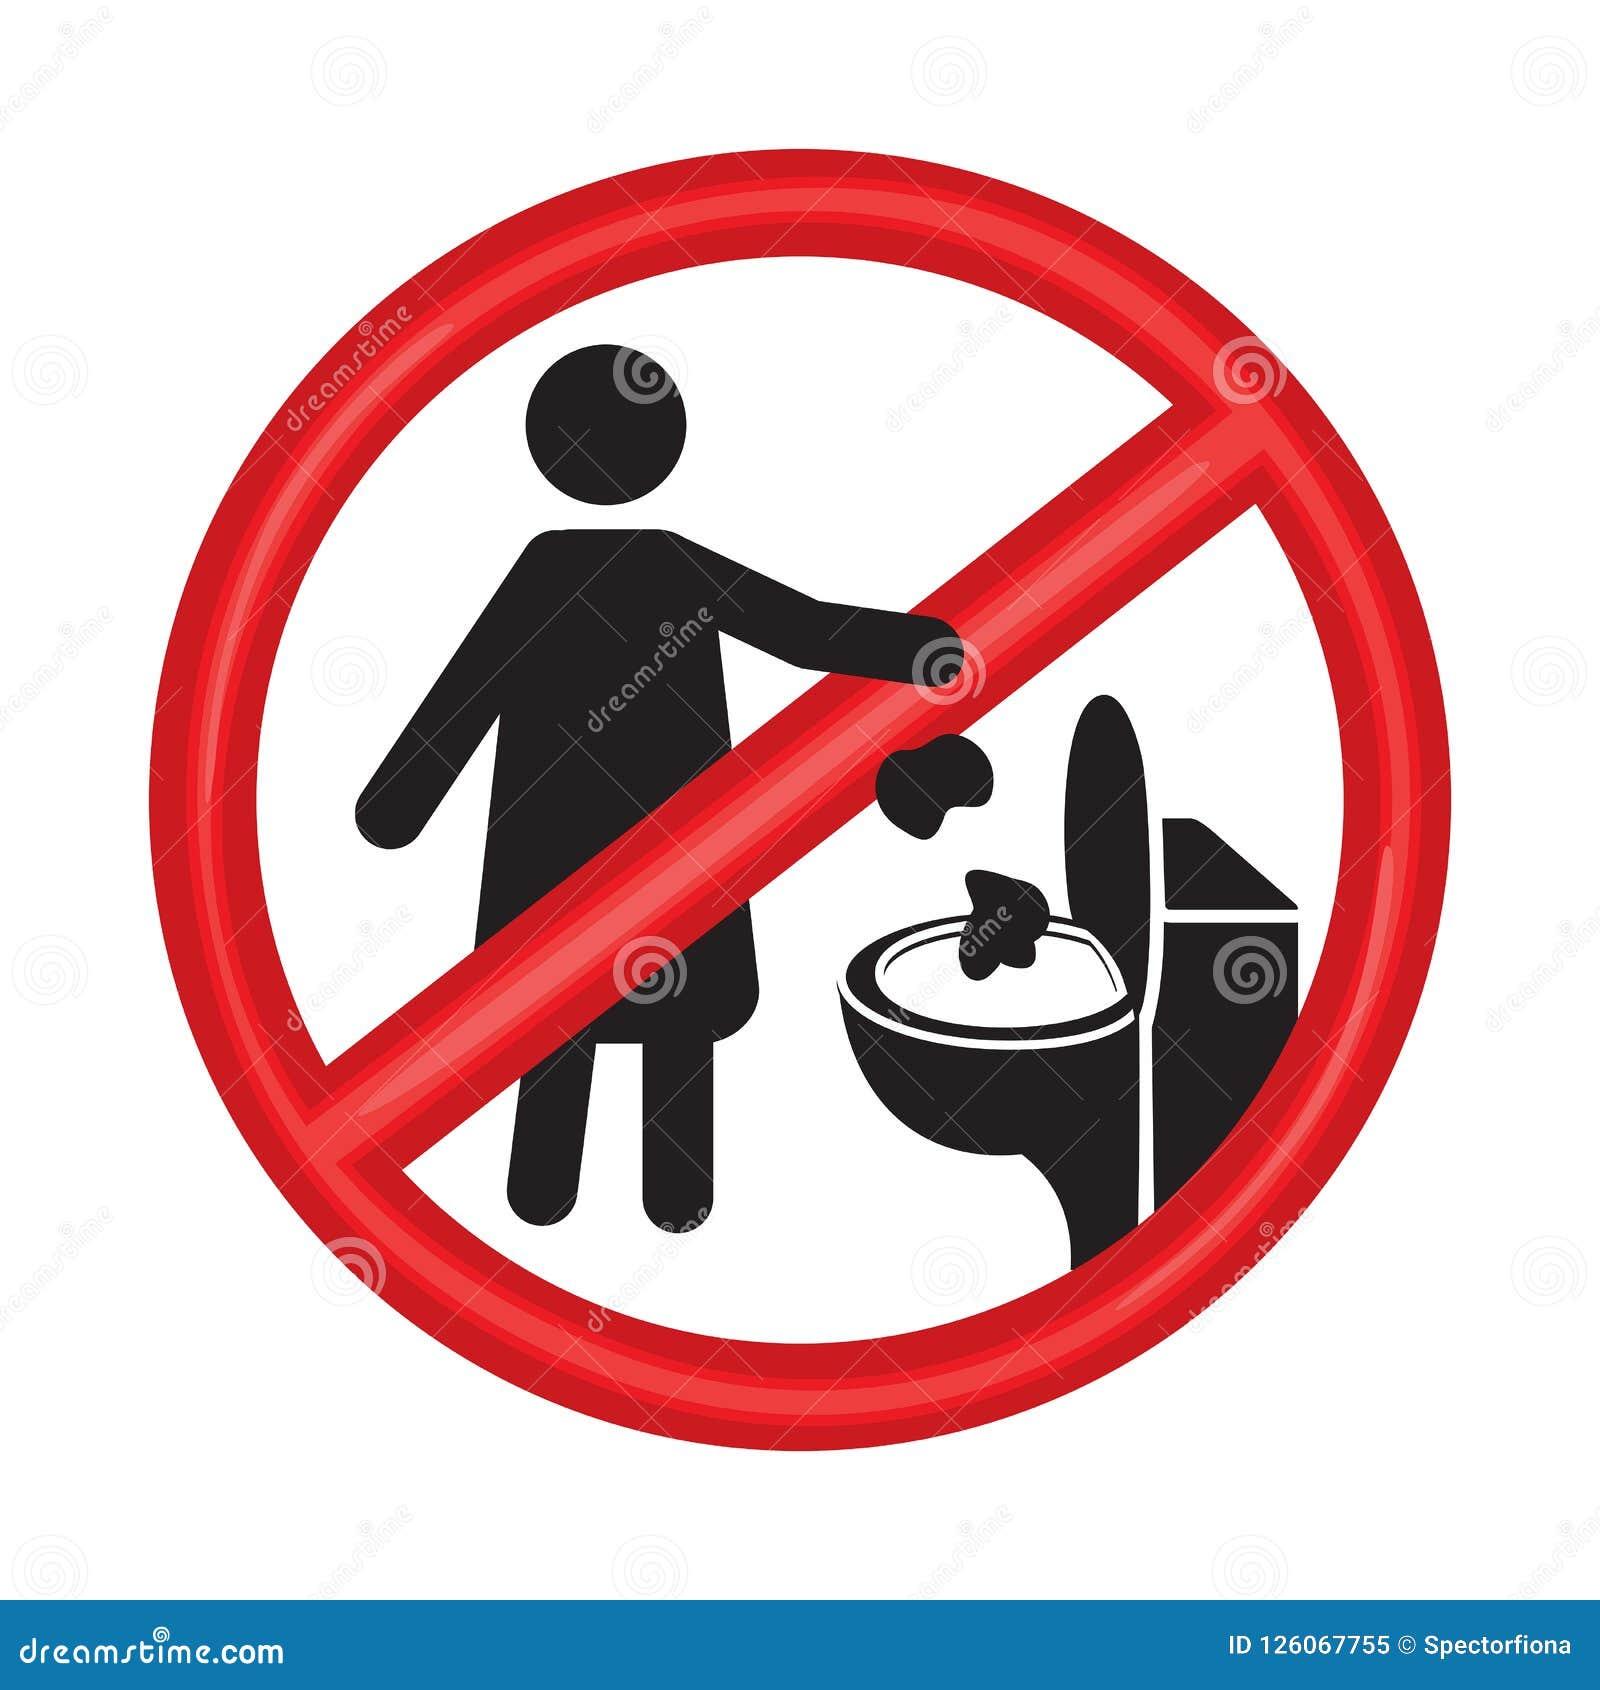 No Toilet Littering Sign Vector Illustration On White